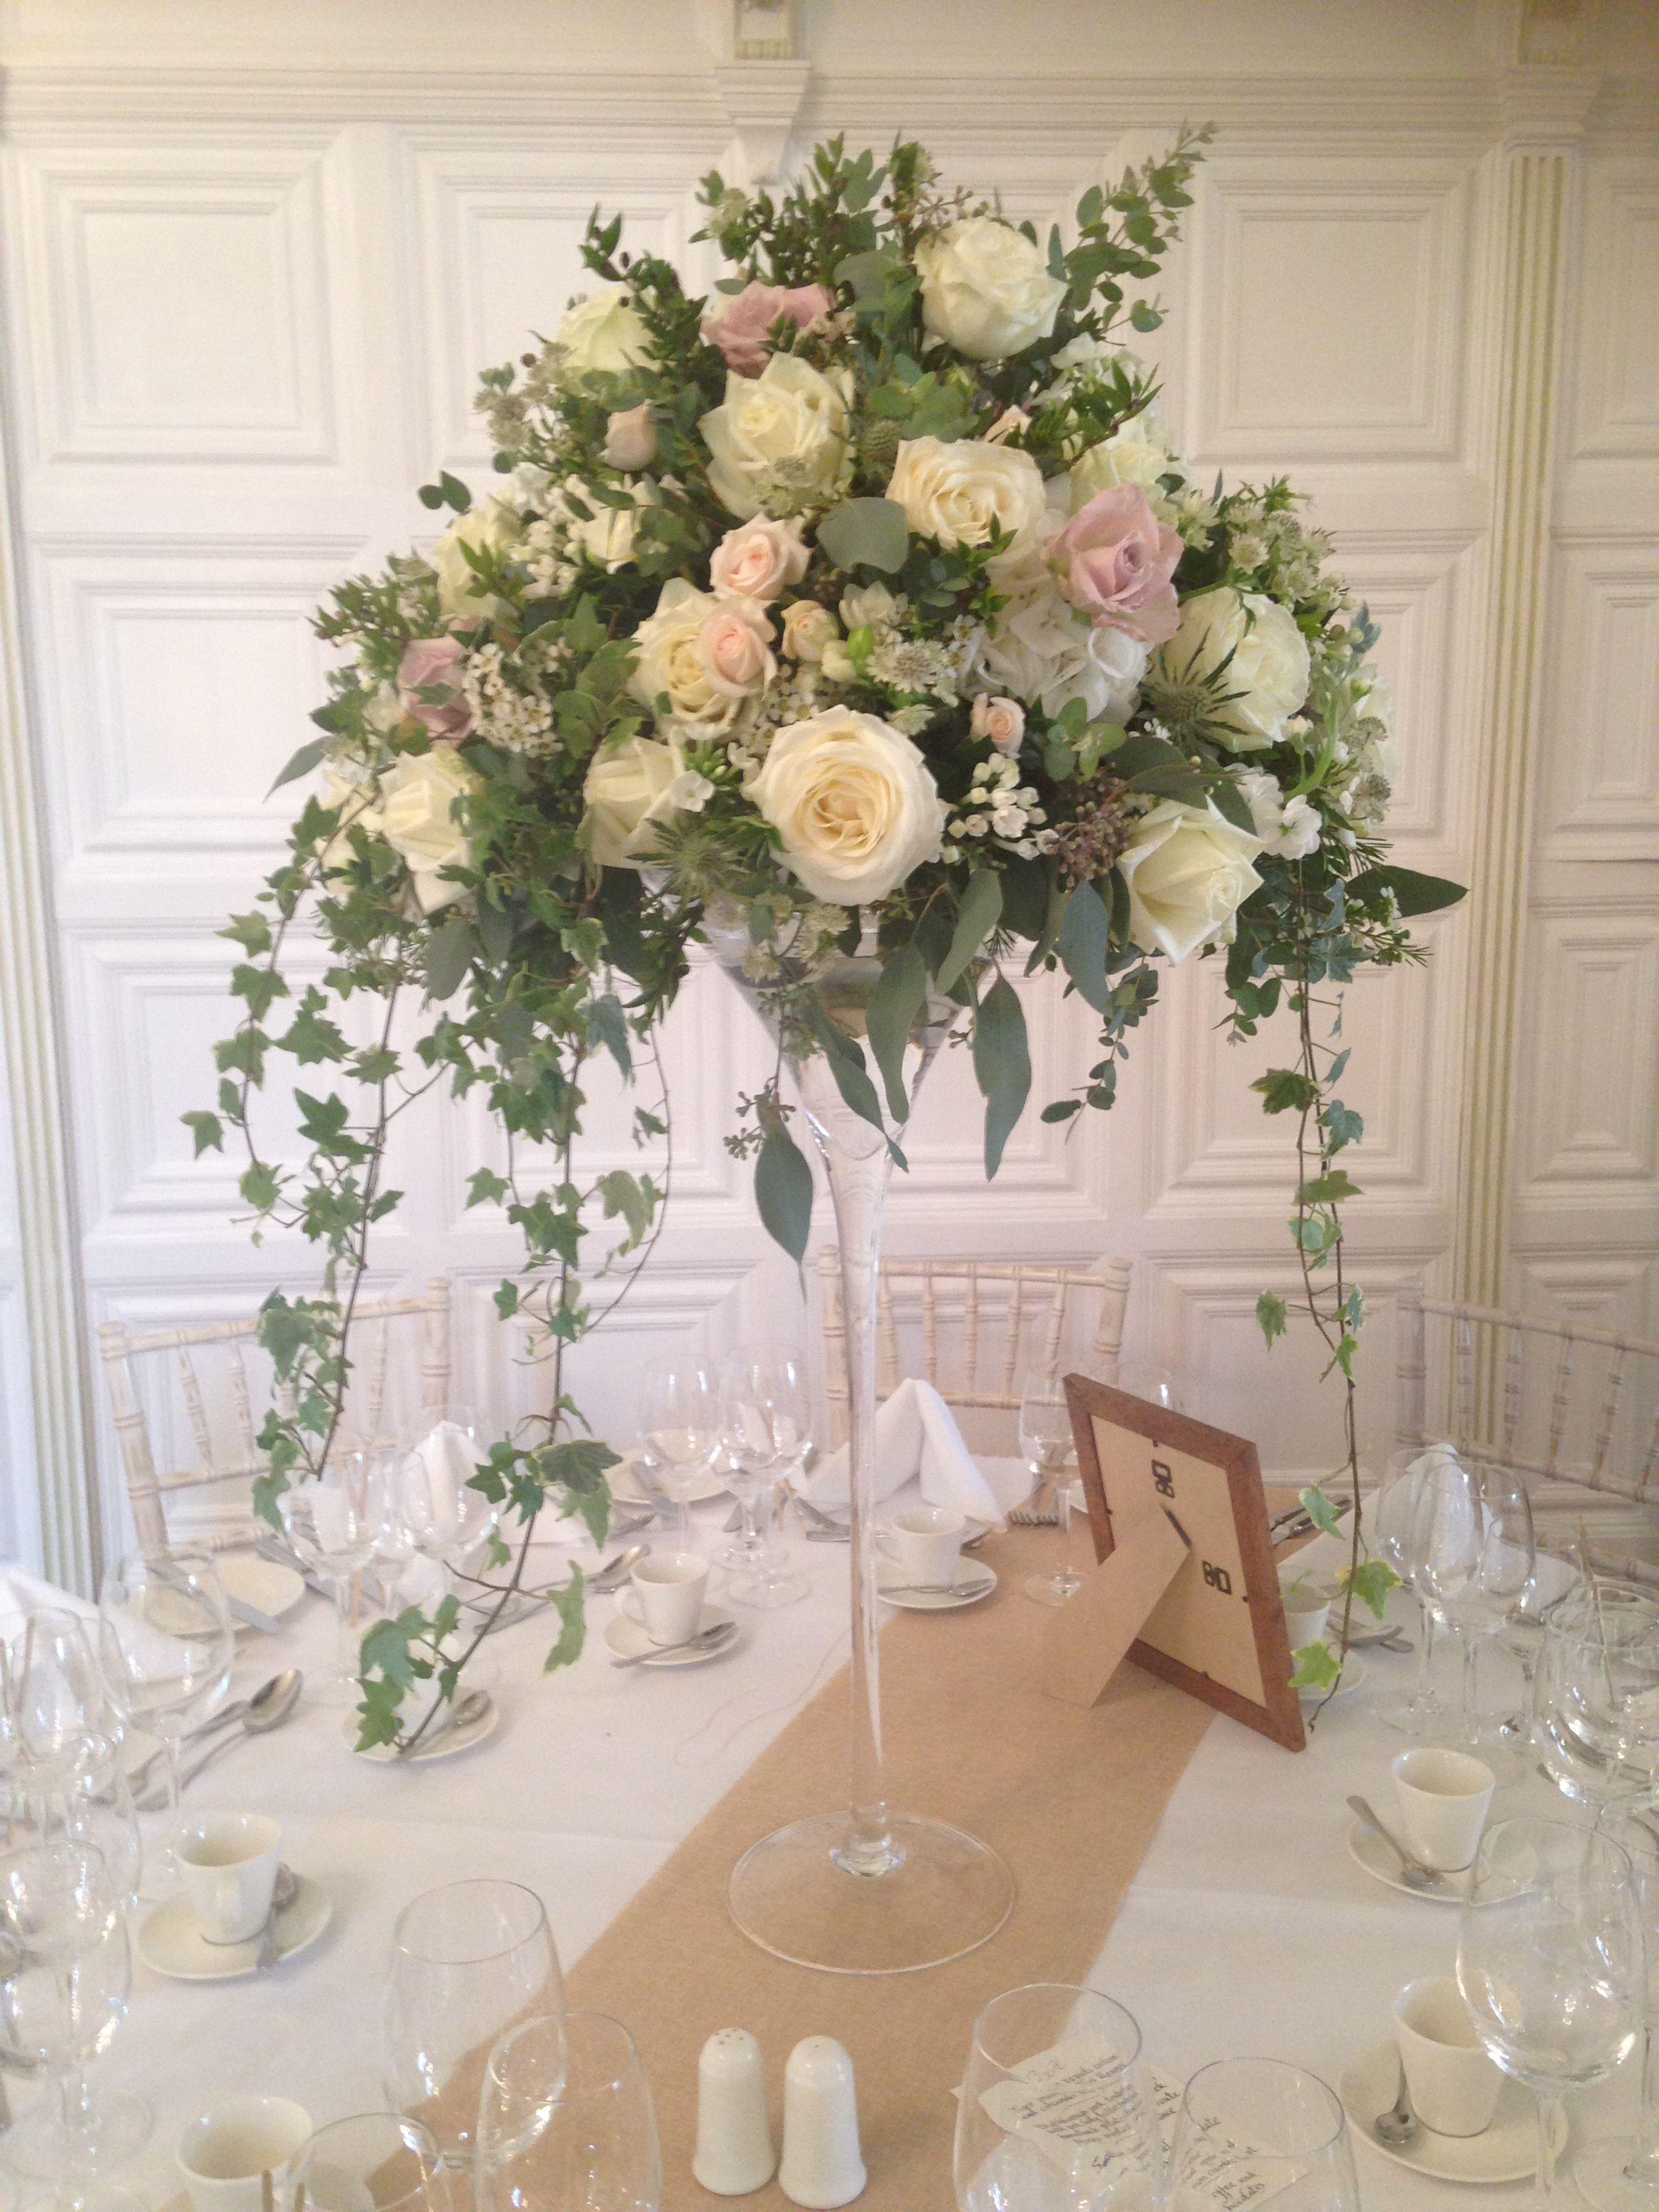 Martini Vase Glamour N Luxury Wedding Centerpieces